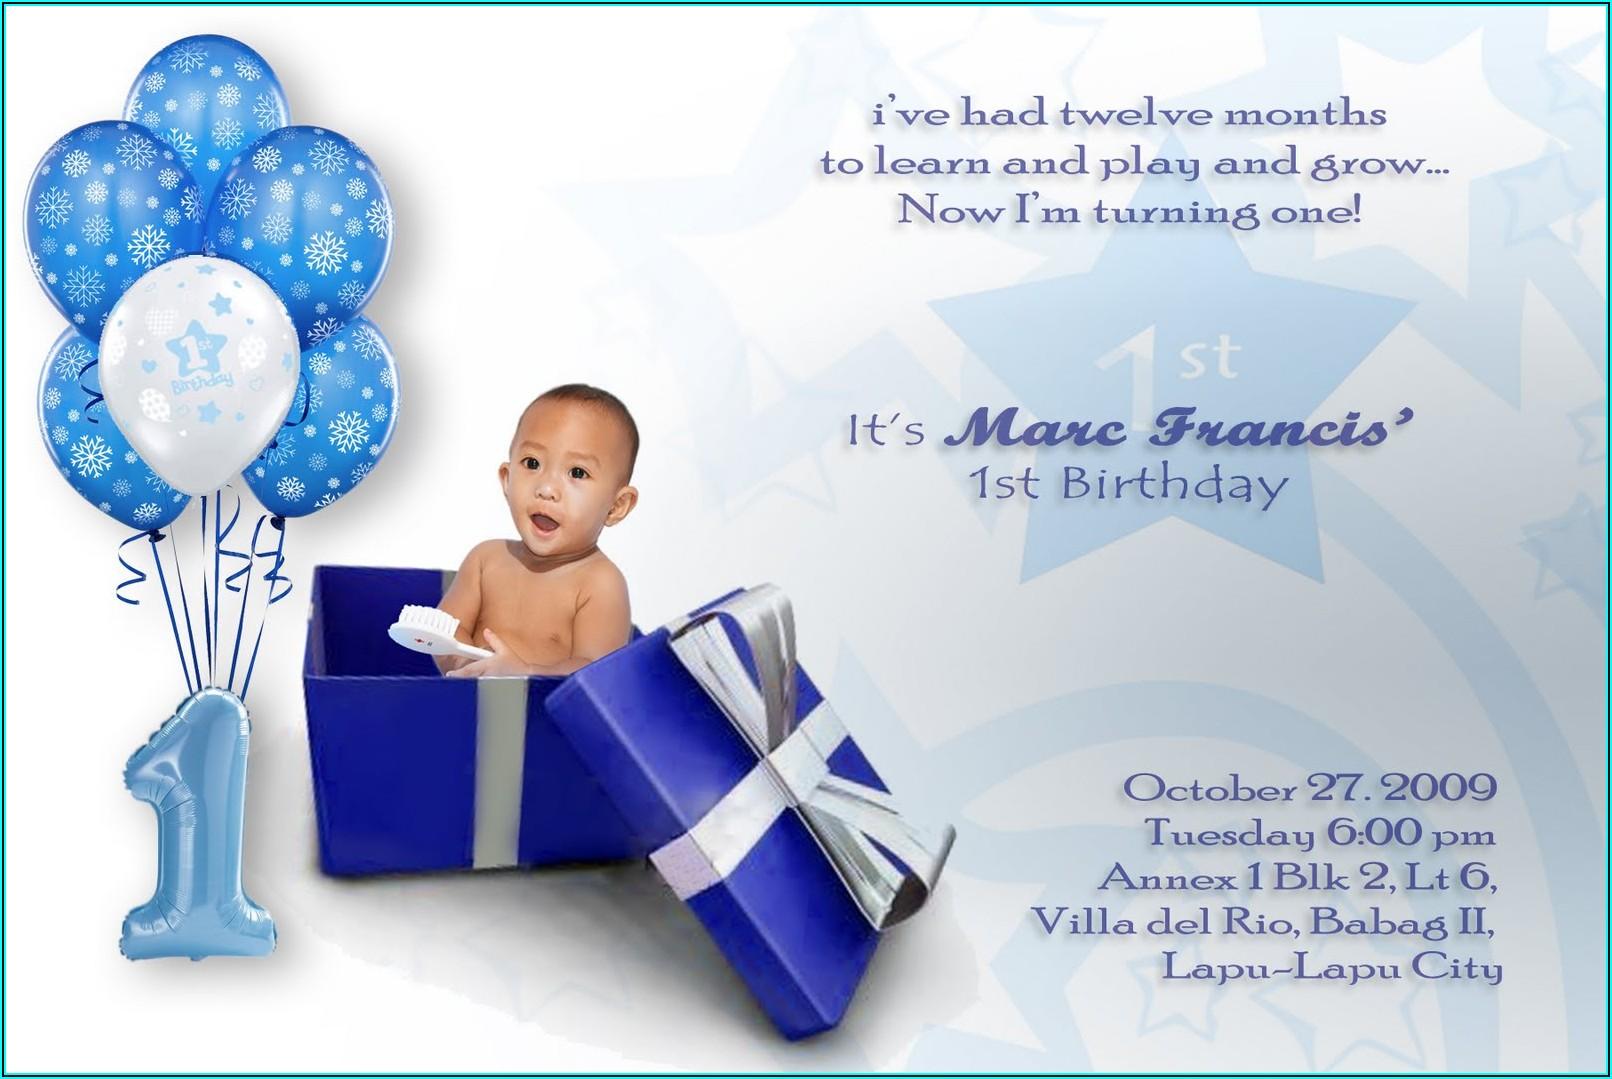 1st Birthday Invitation Card Psd Free Download